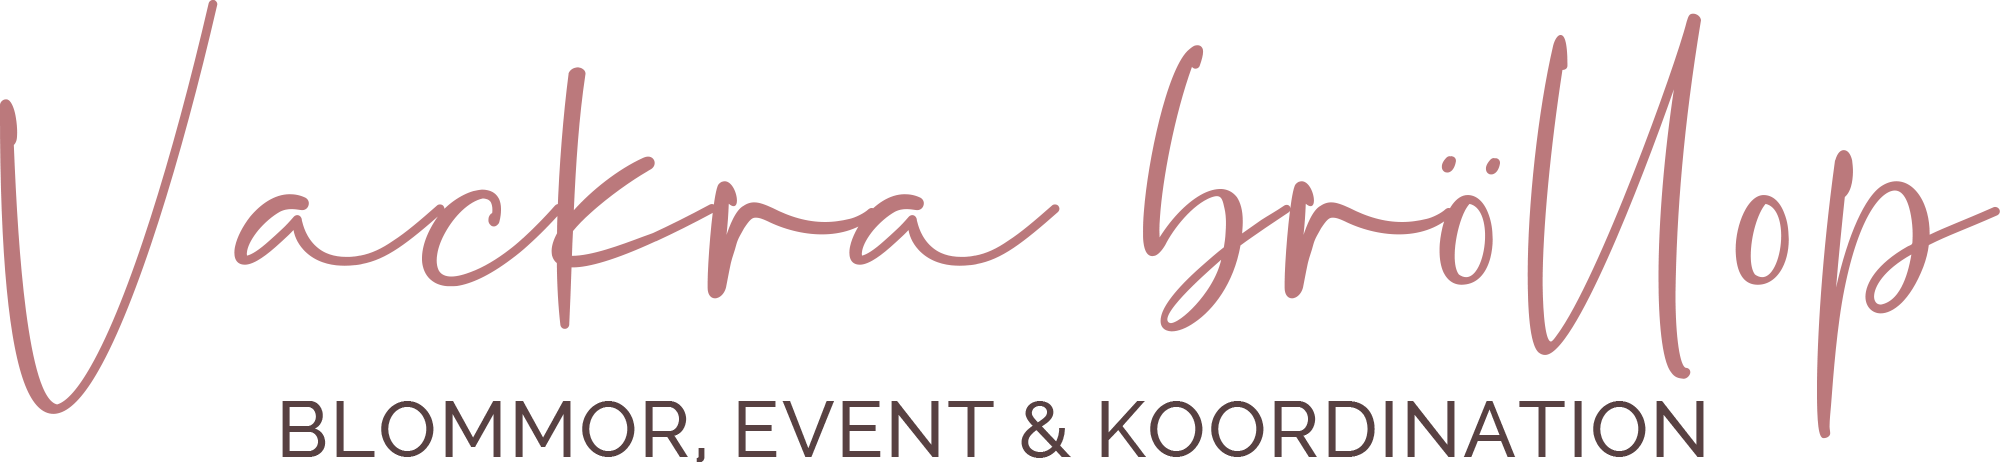 Vackra Bröllop - Florist, Event & Bröllopskoordinator